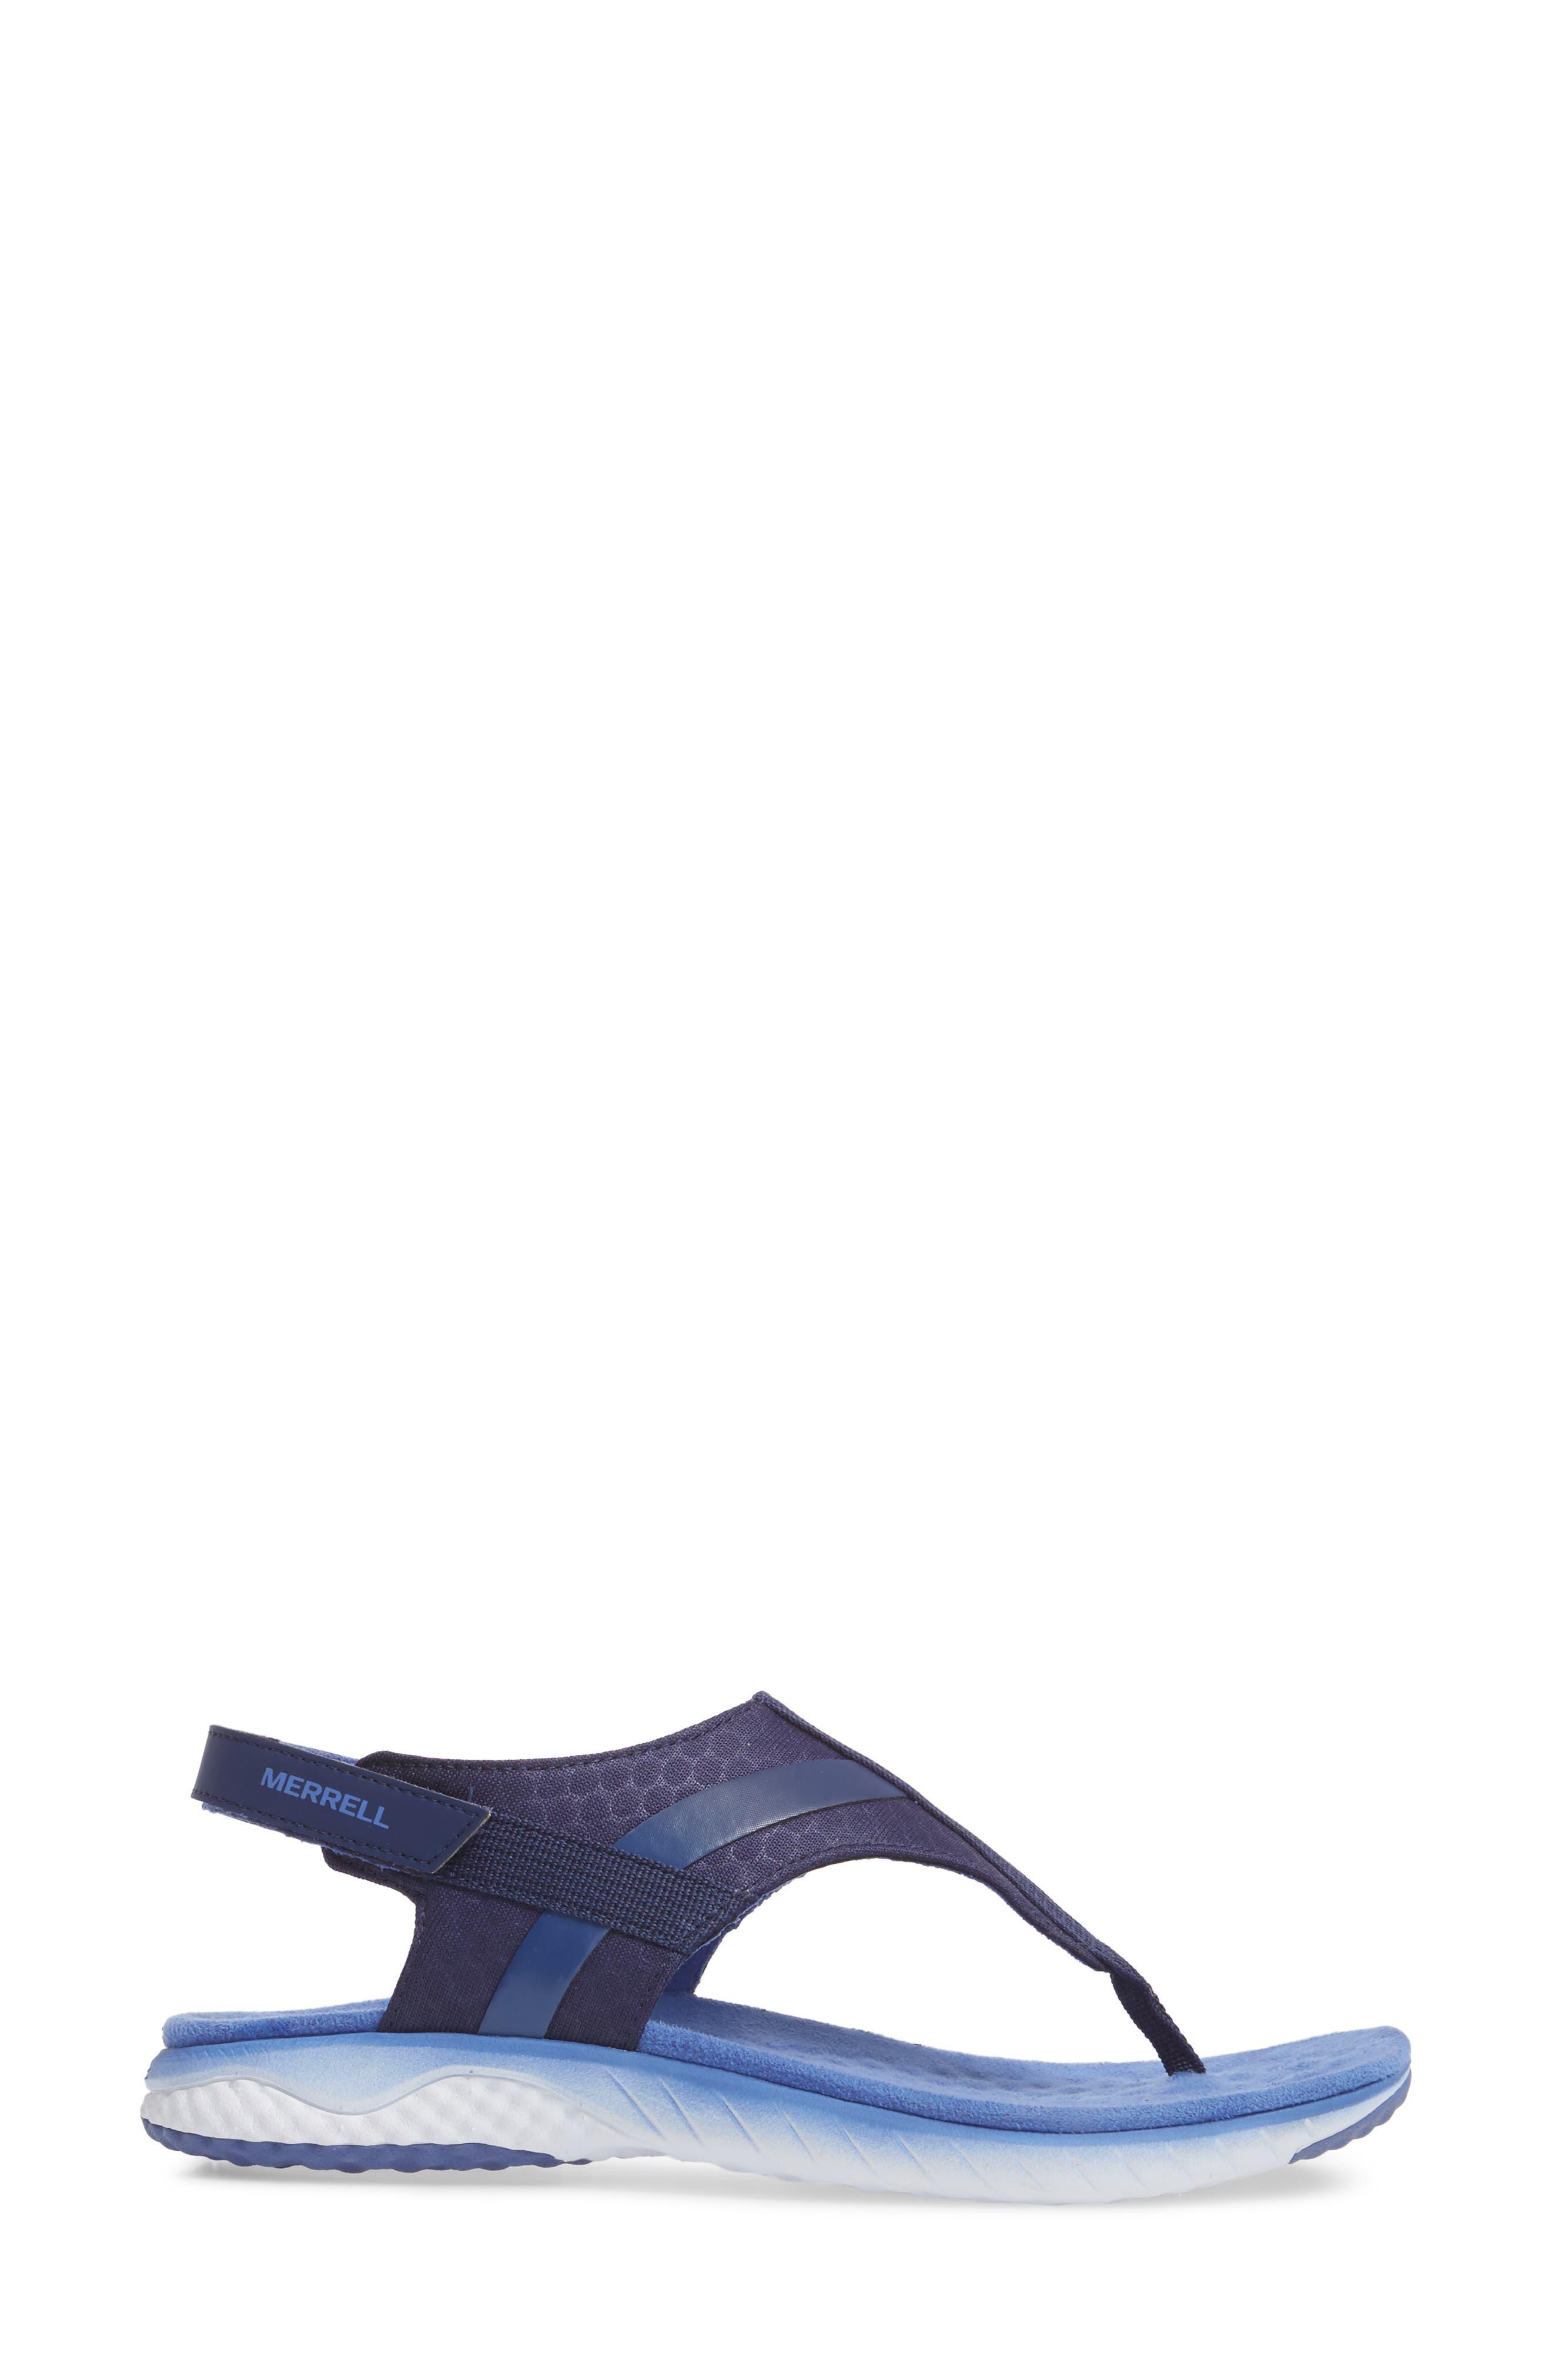 1SIX8 Linna Slide Air Cushion+ Sandal,                             Alternate thumbnail 11, color,